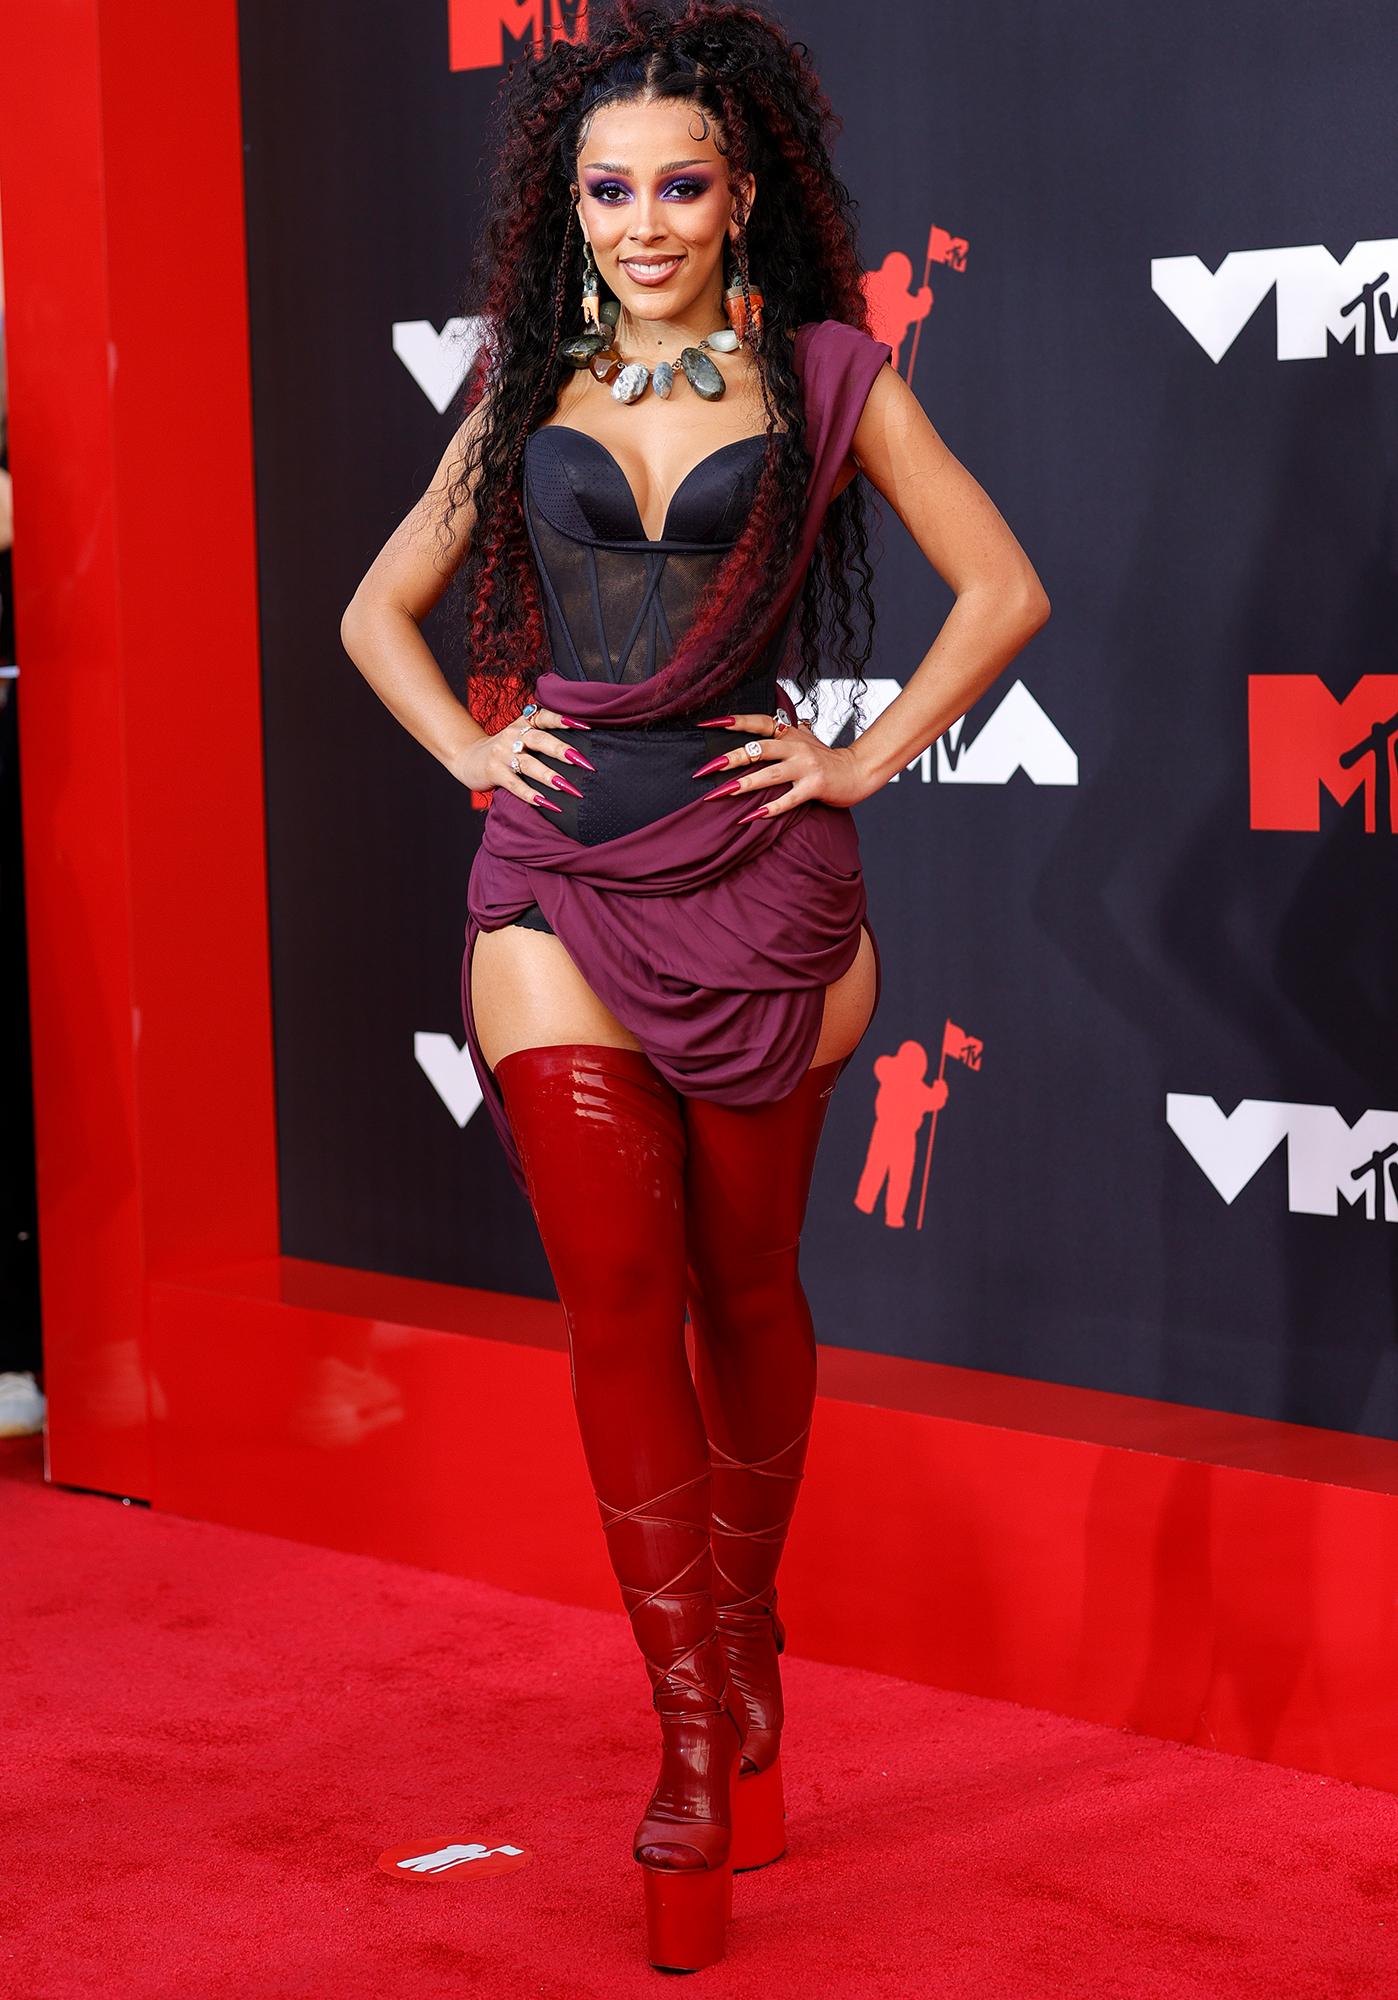 Doja Cat arrives at the 2021 MTV Video Music Awards